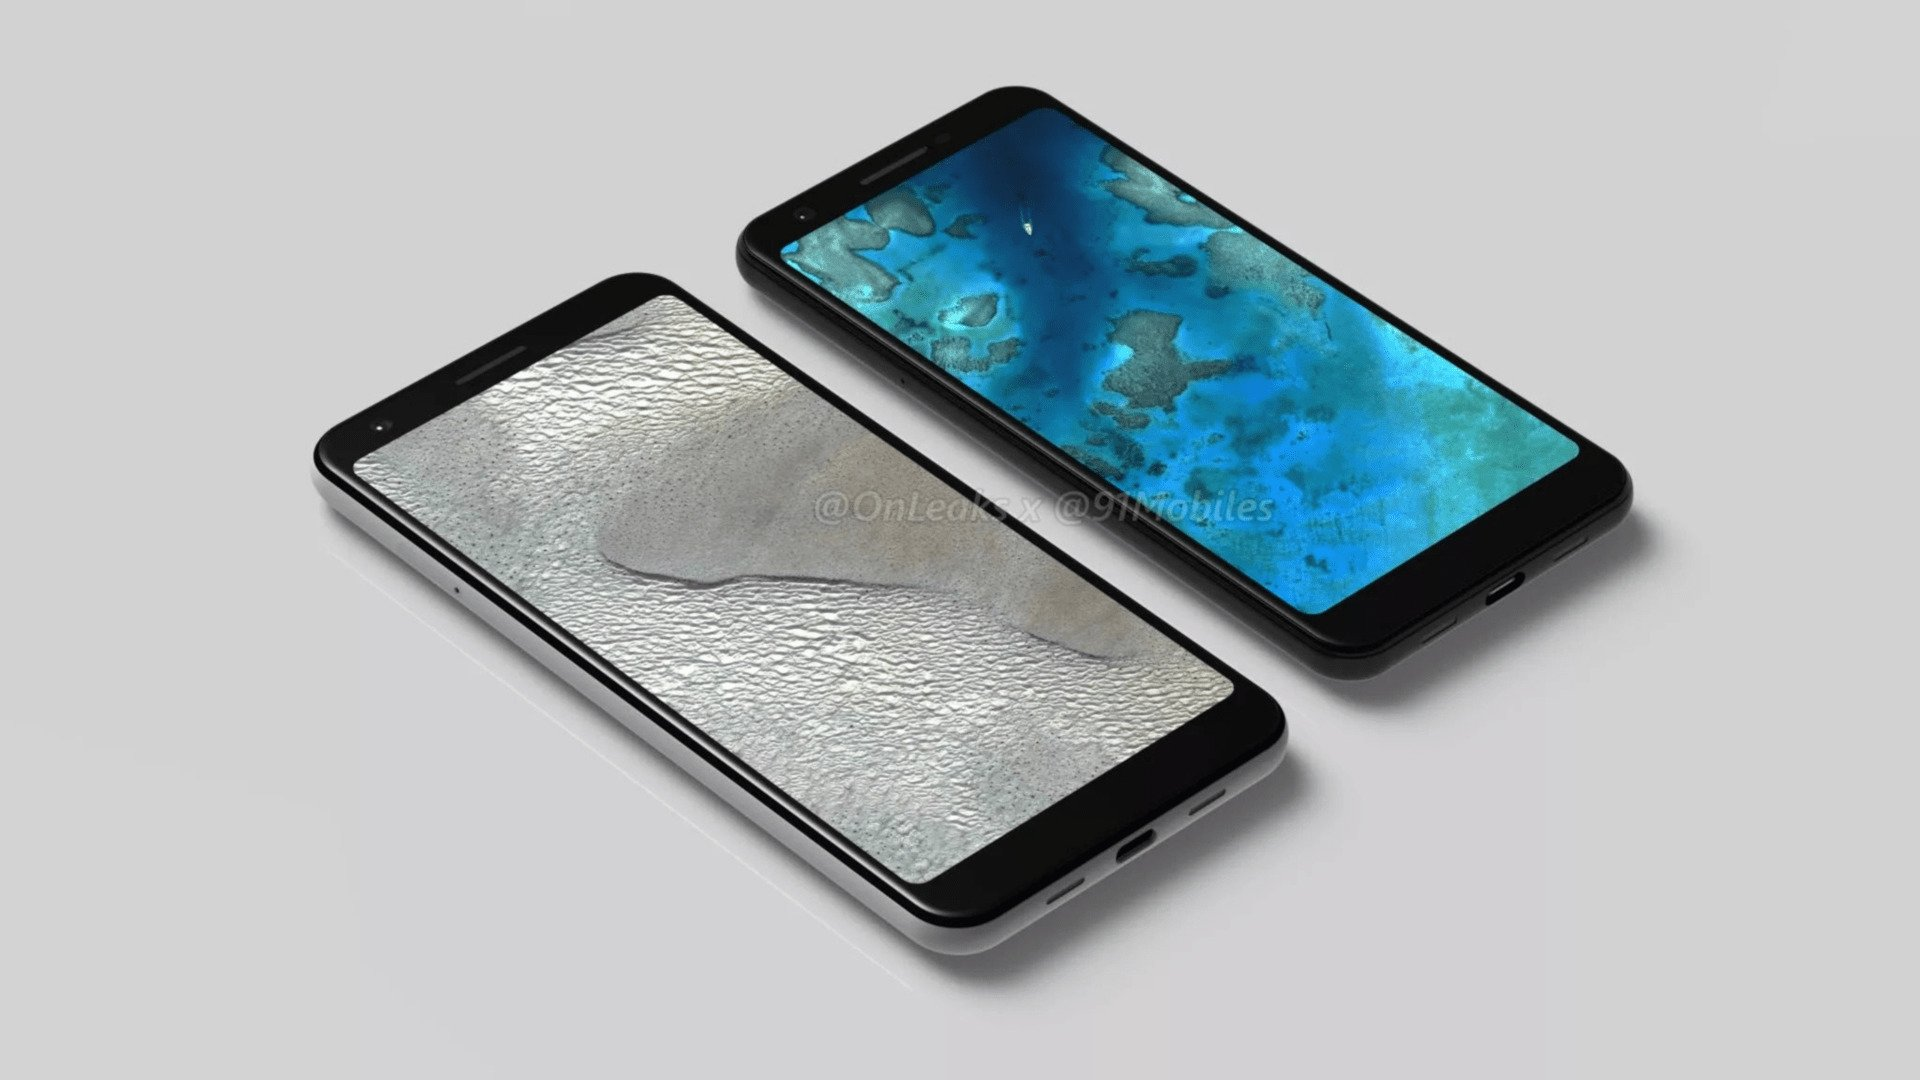 Renders of alleged Google Pixel 3 XL Lite, Pixel 3 Lite leaked online